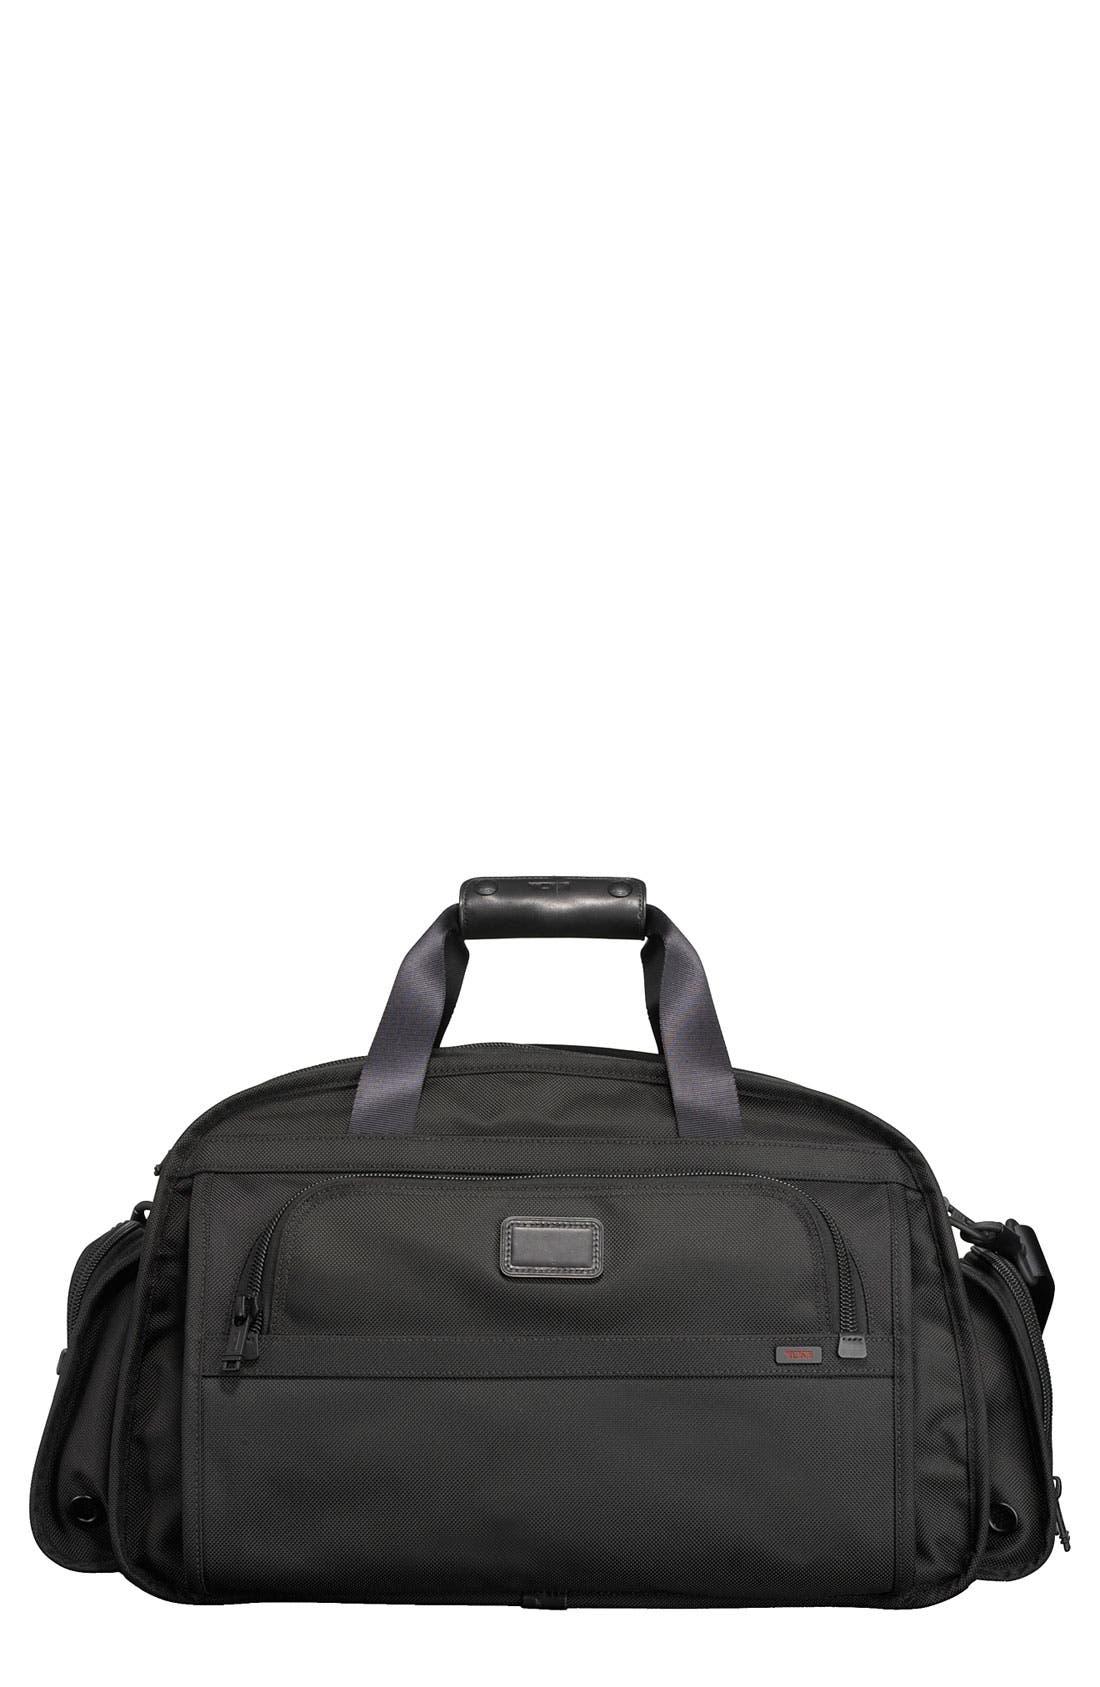 Main Image - Tumi 'Alpha' Sport Duffel Bag